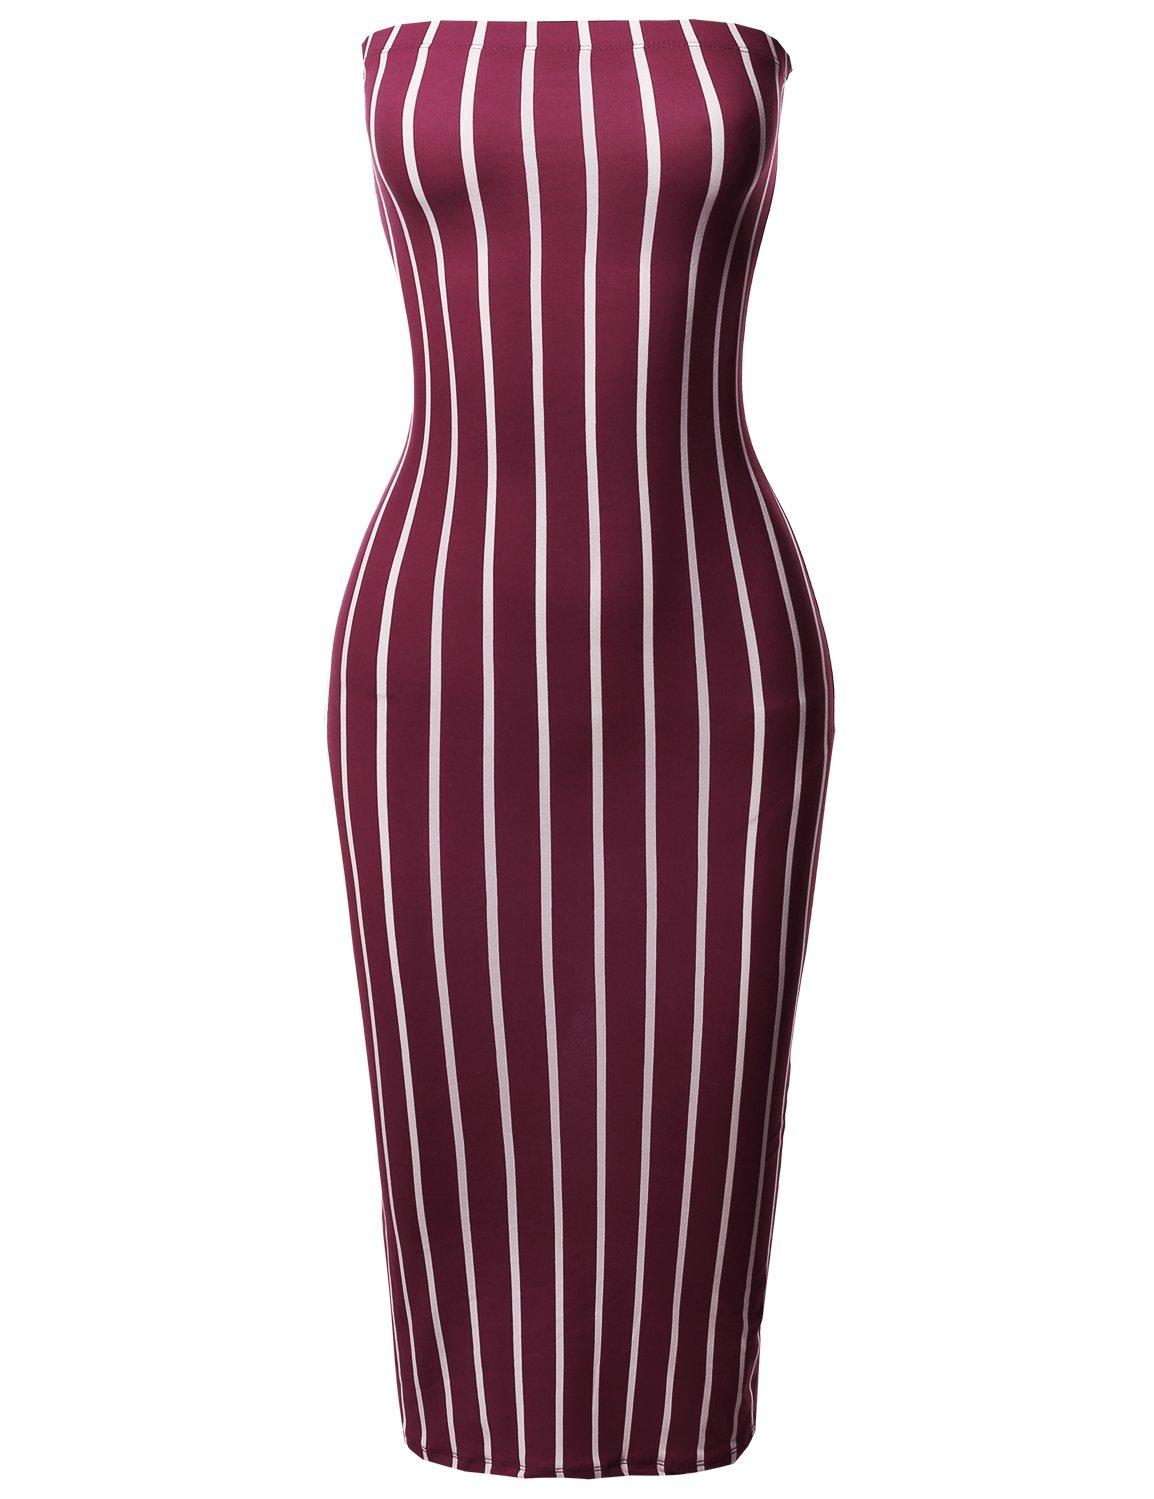 Made by Emma Pinstripe Print Body-Con Tube Midi Dress Burgundy M